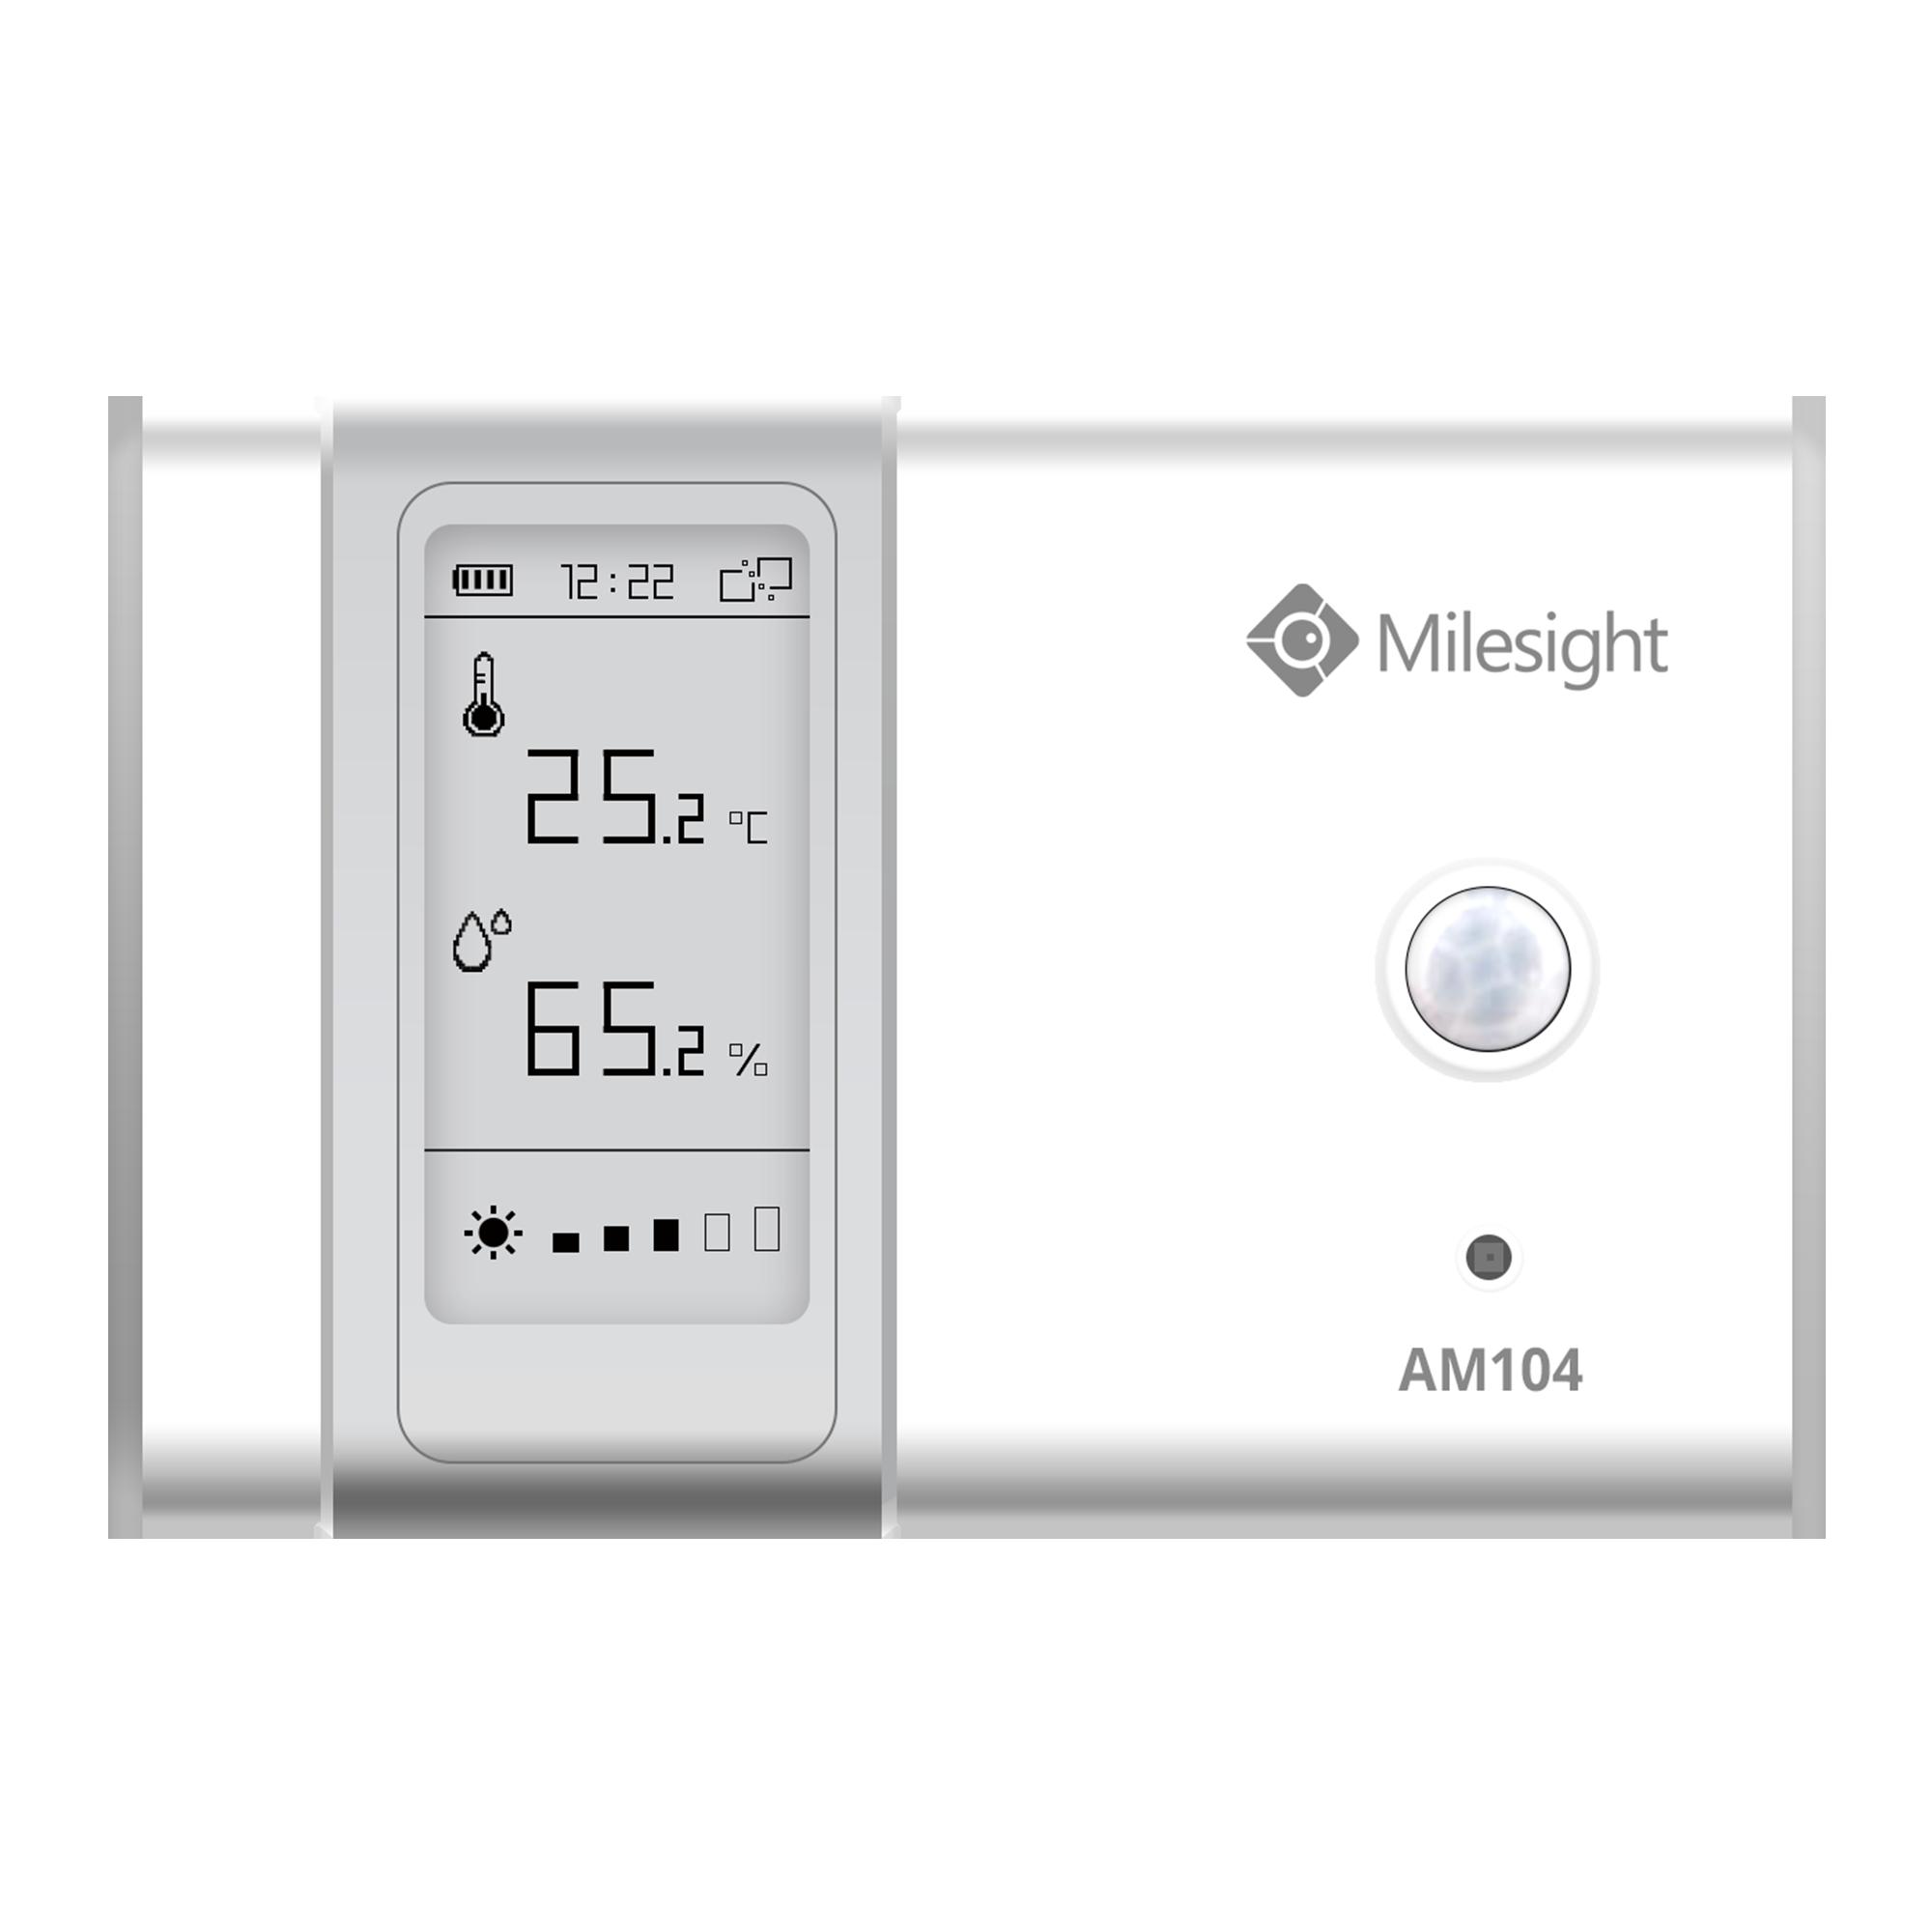 Milesight IoT AM 104 E-Ink Indoor Sensor LoRaWAN